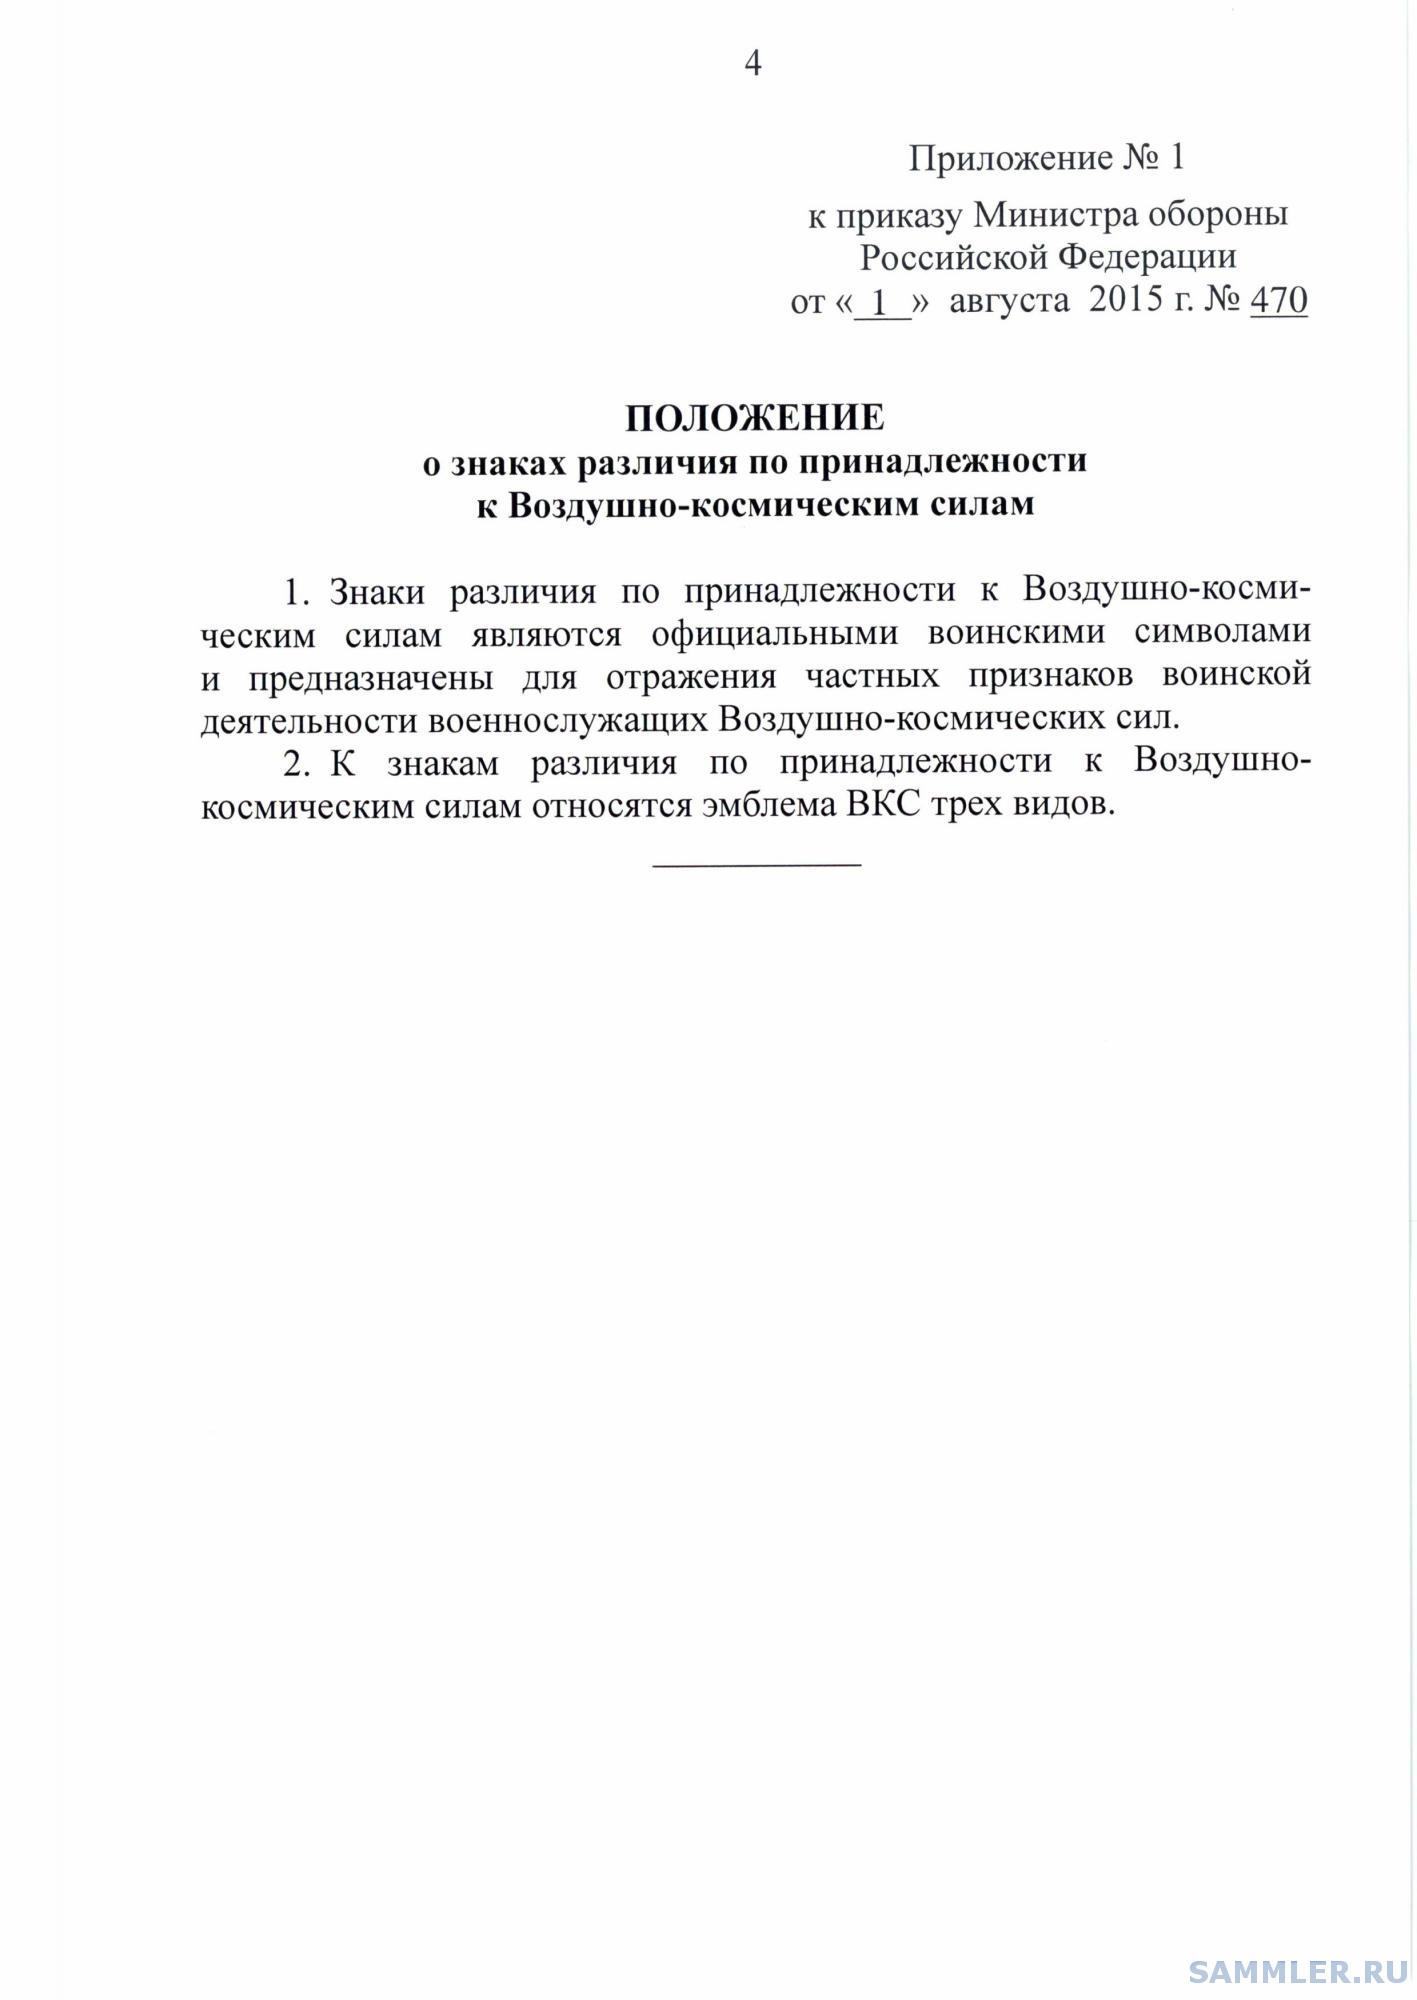 МО РФ 470(цвет)-4.jpg